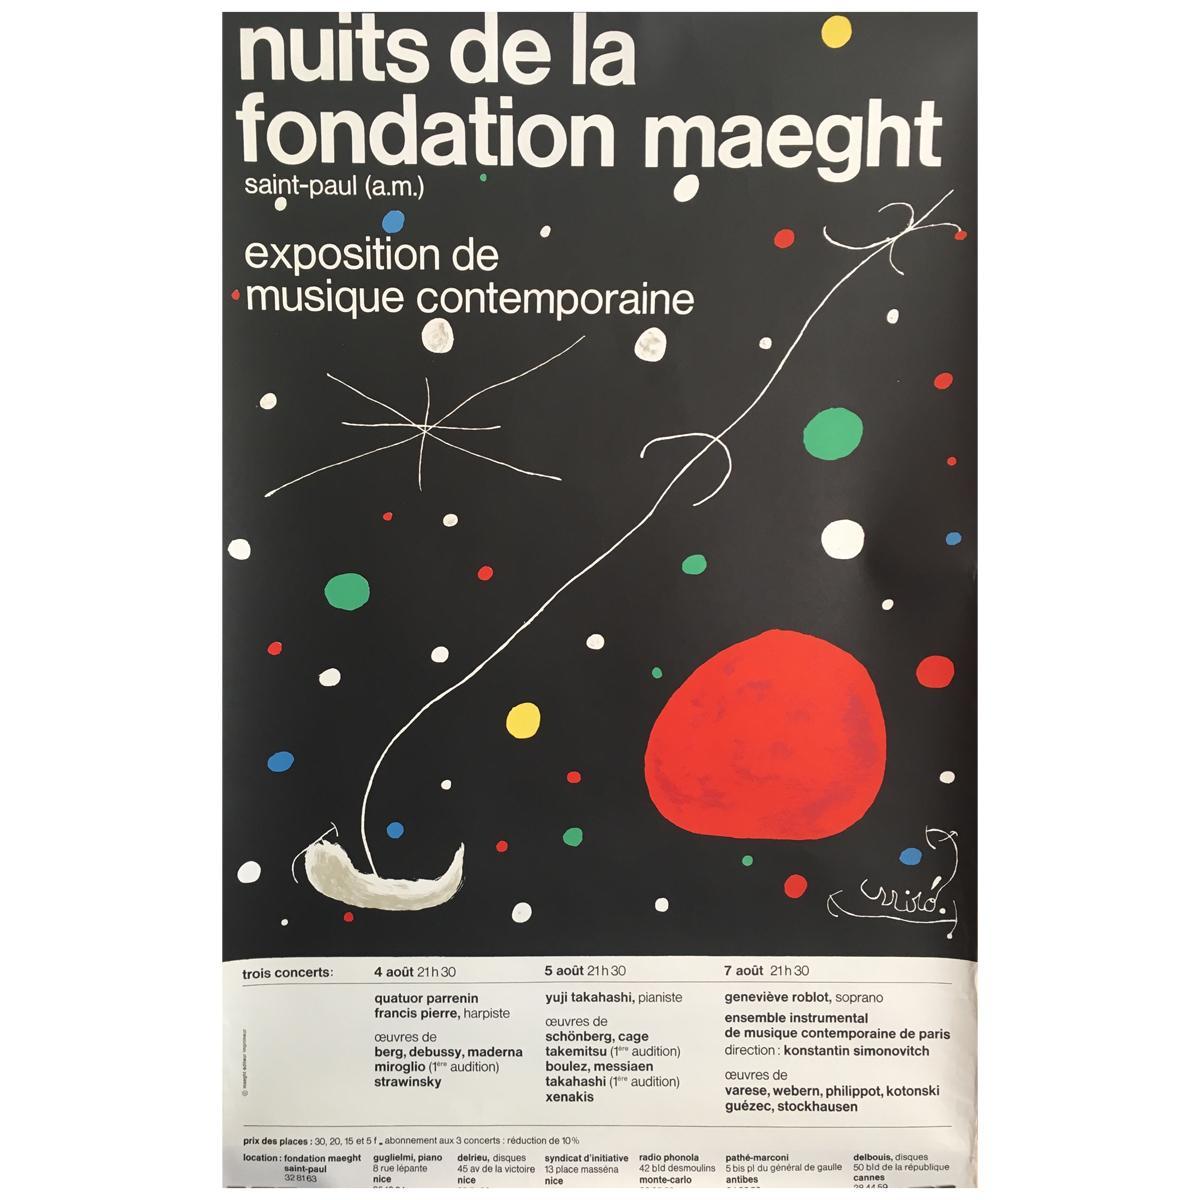 Original Vintage Art & Exhibition Poster Joan Miró Nuits De La Fondation Maeght